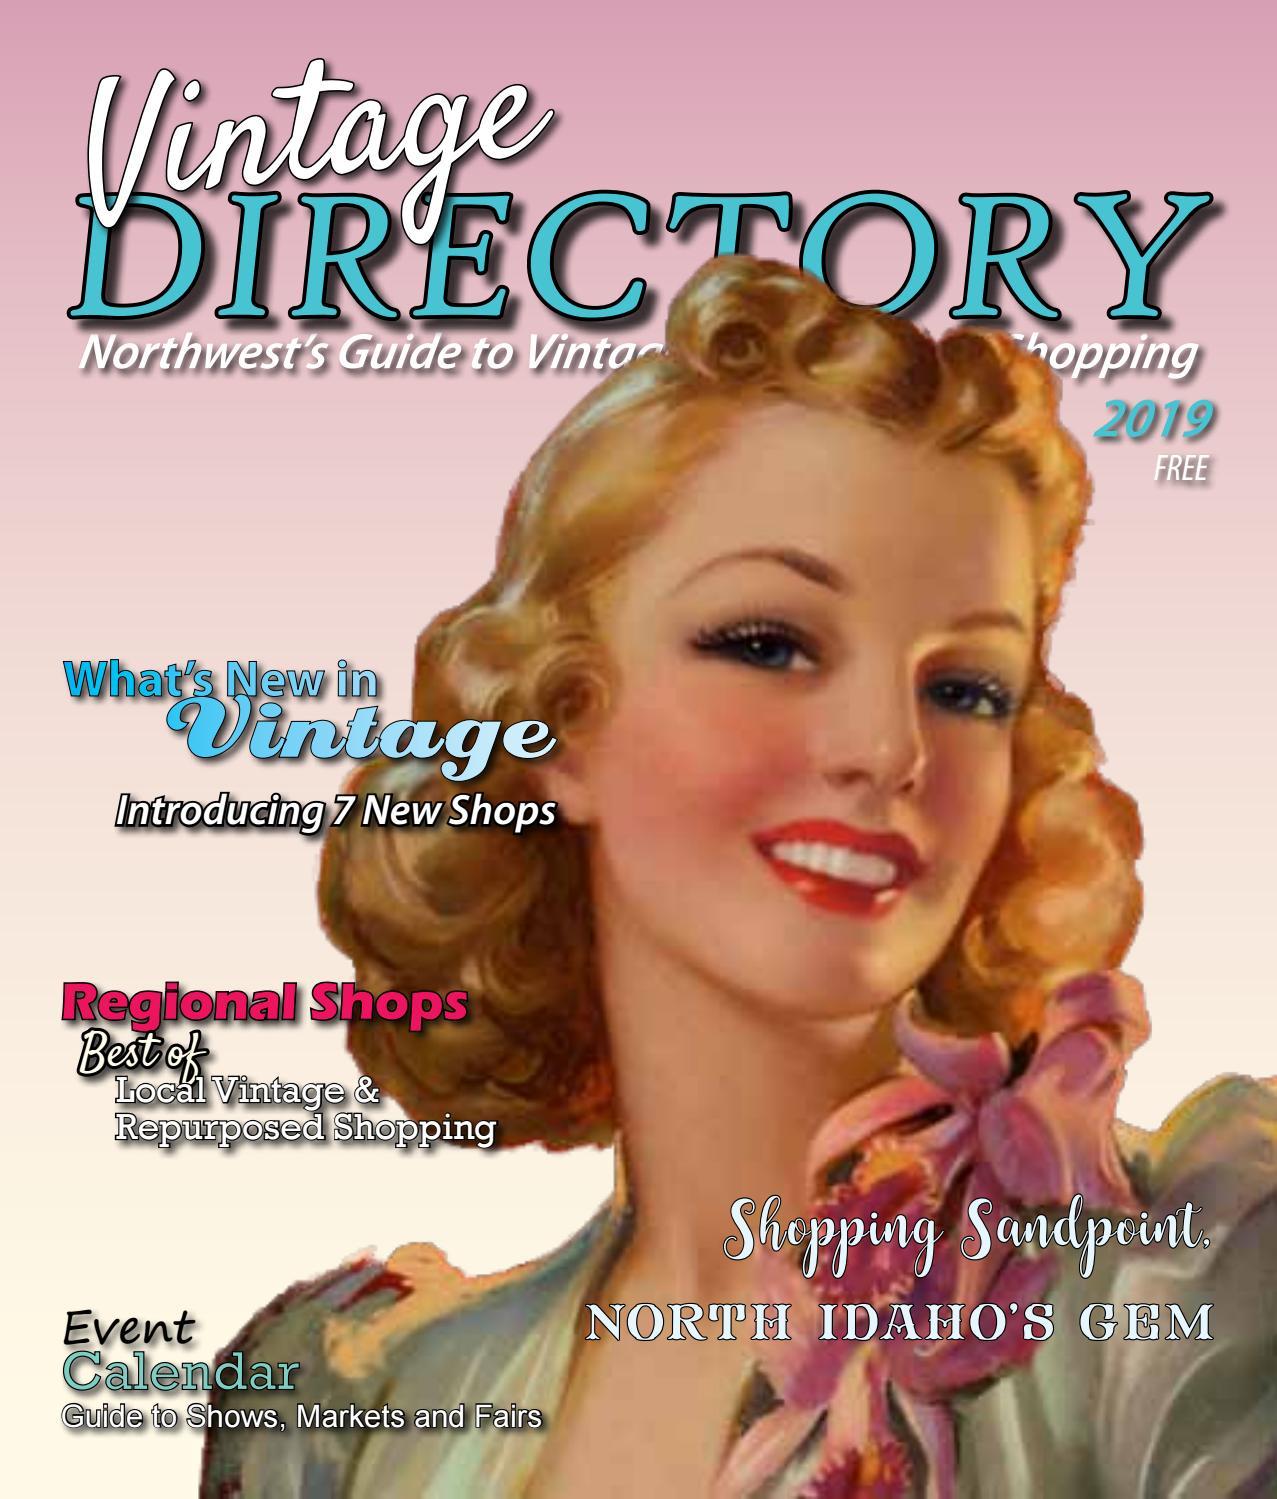 2019 Vintage Directory By Vintage Directory Issuu